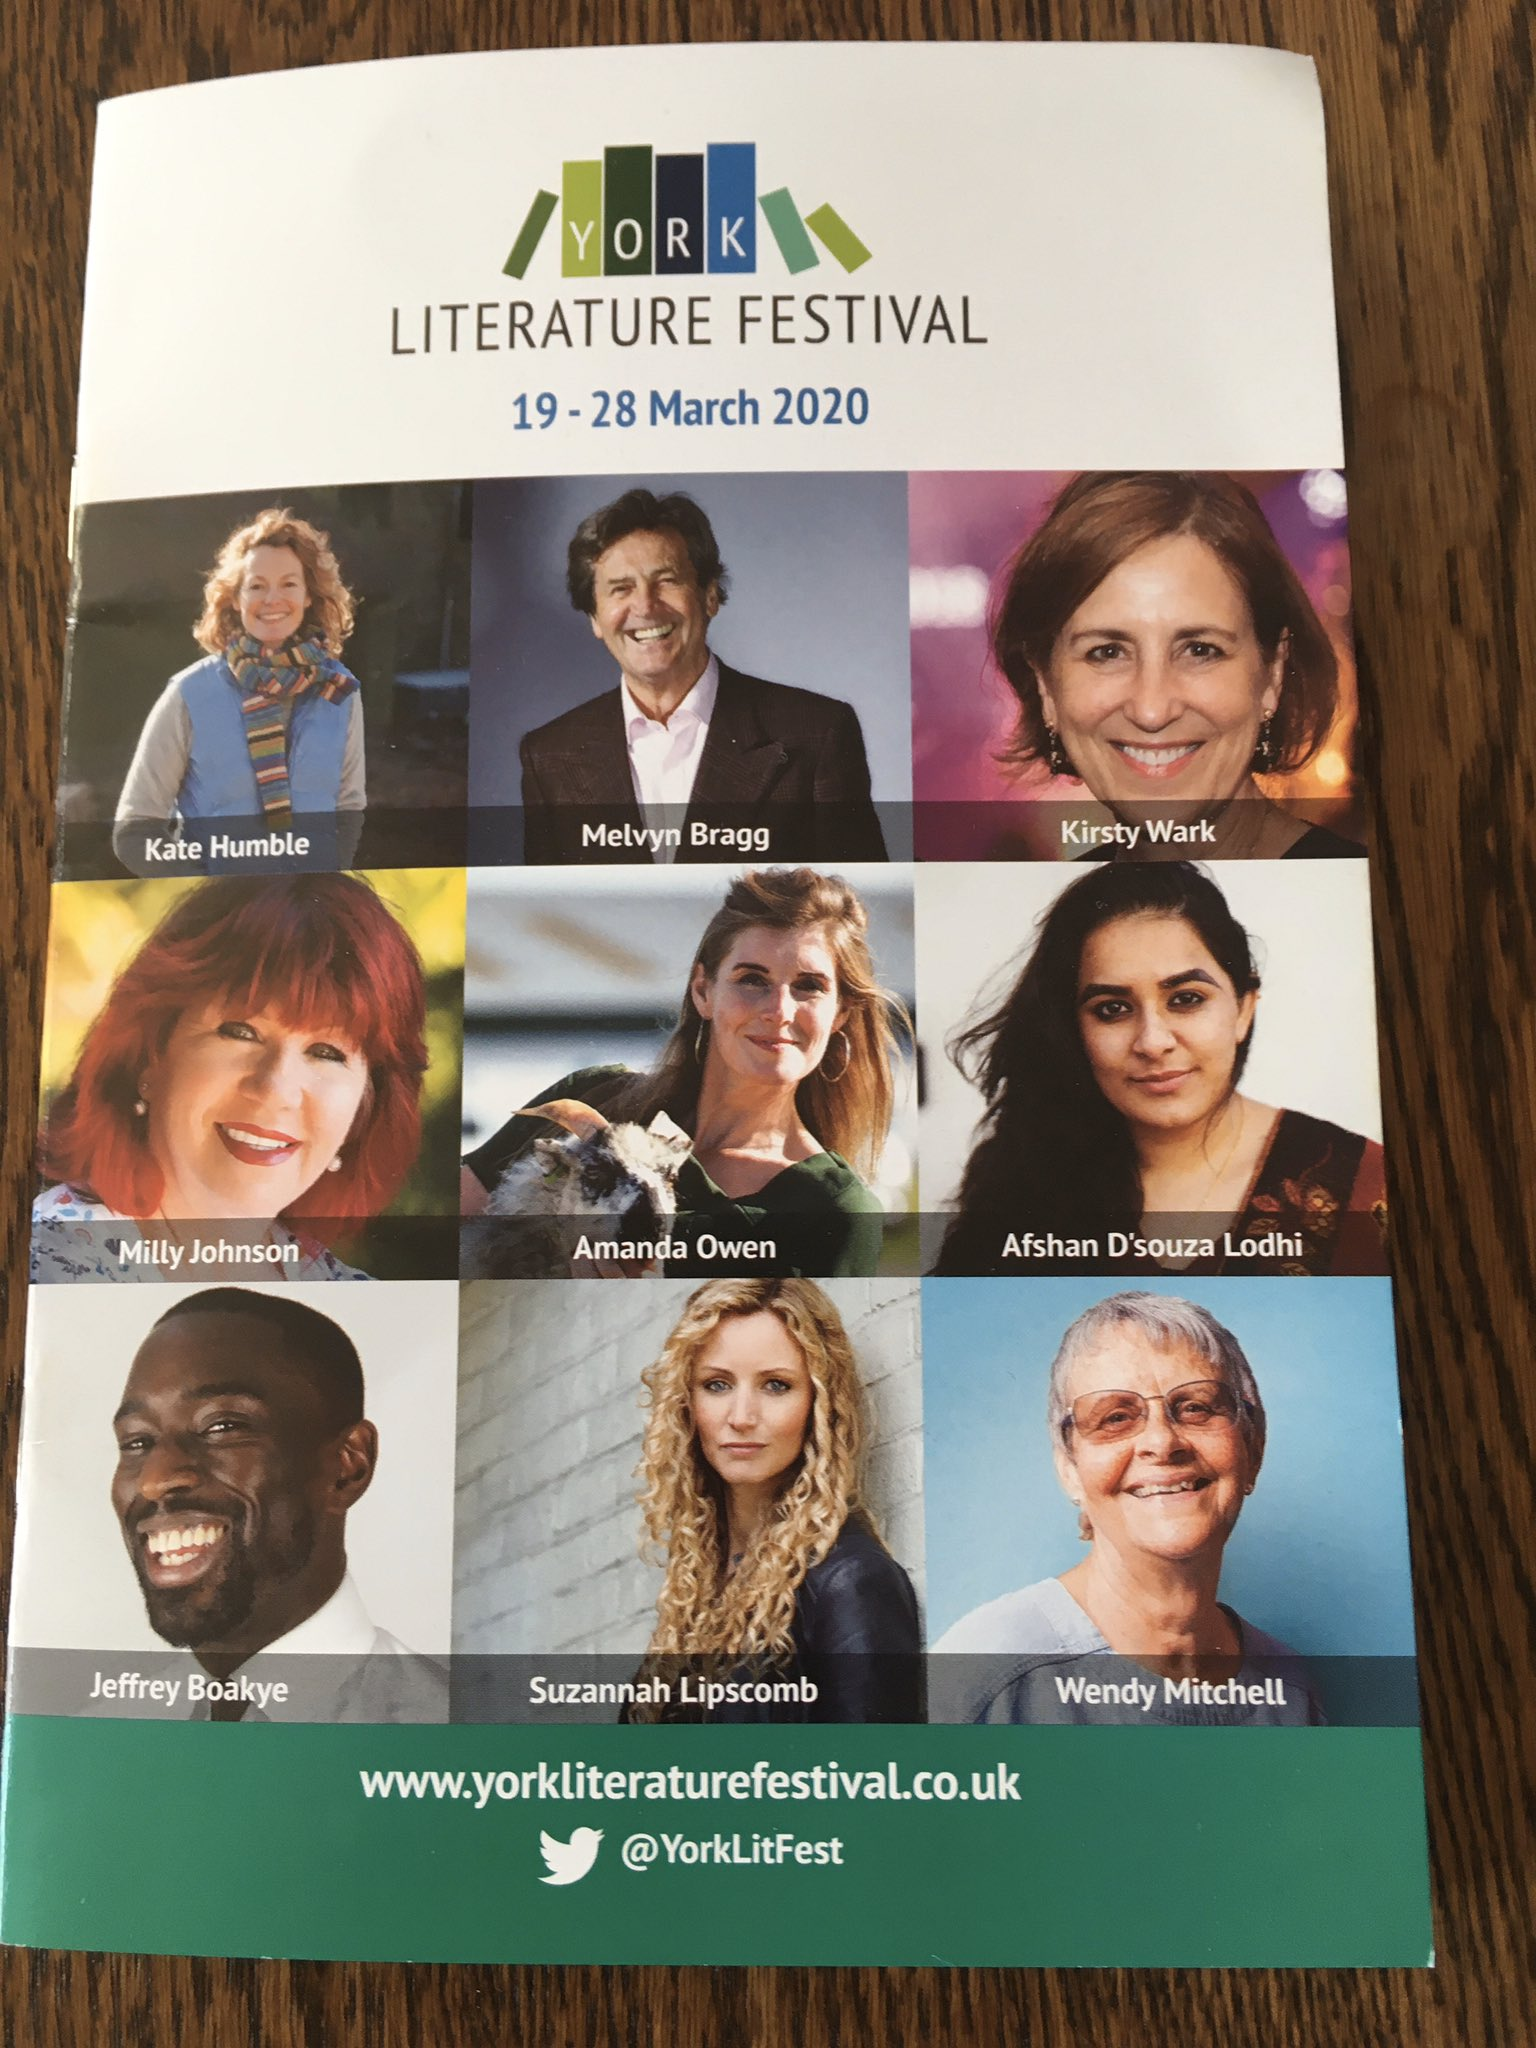 York Literature Festival 2020